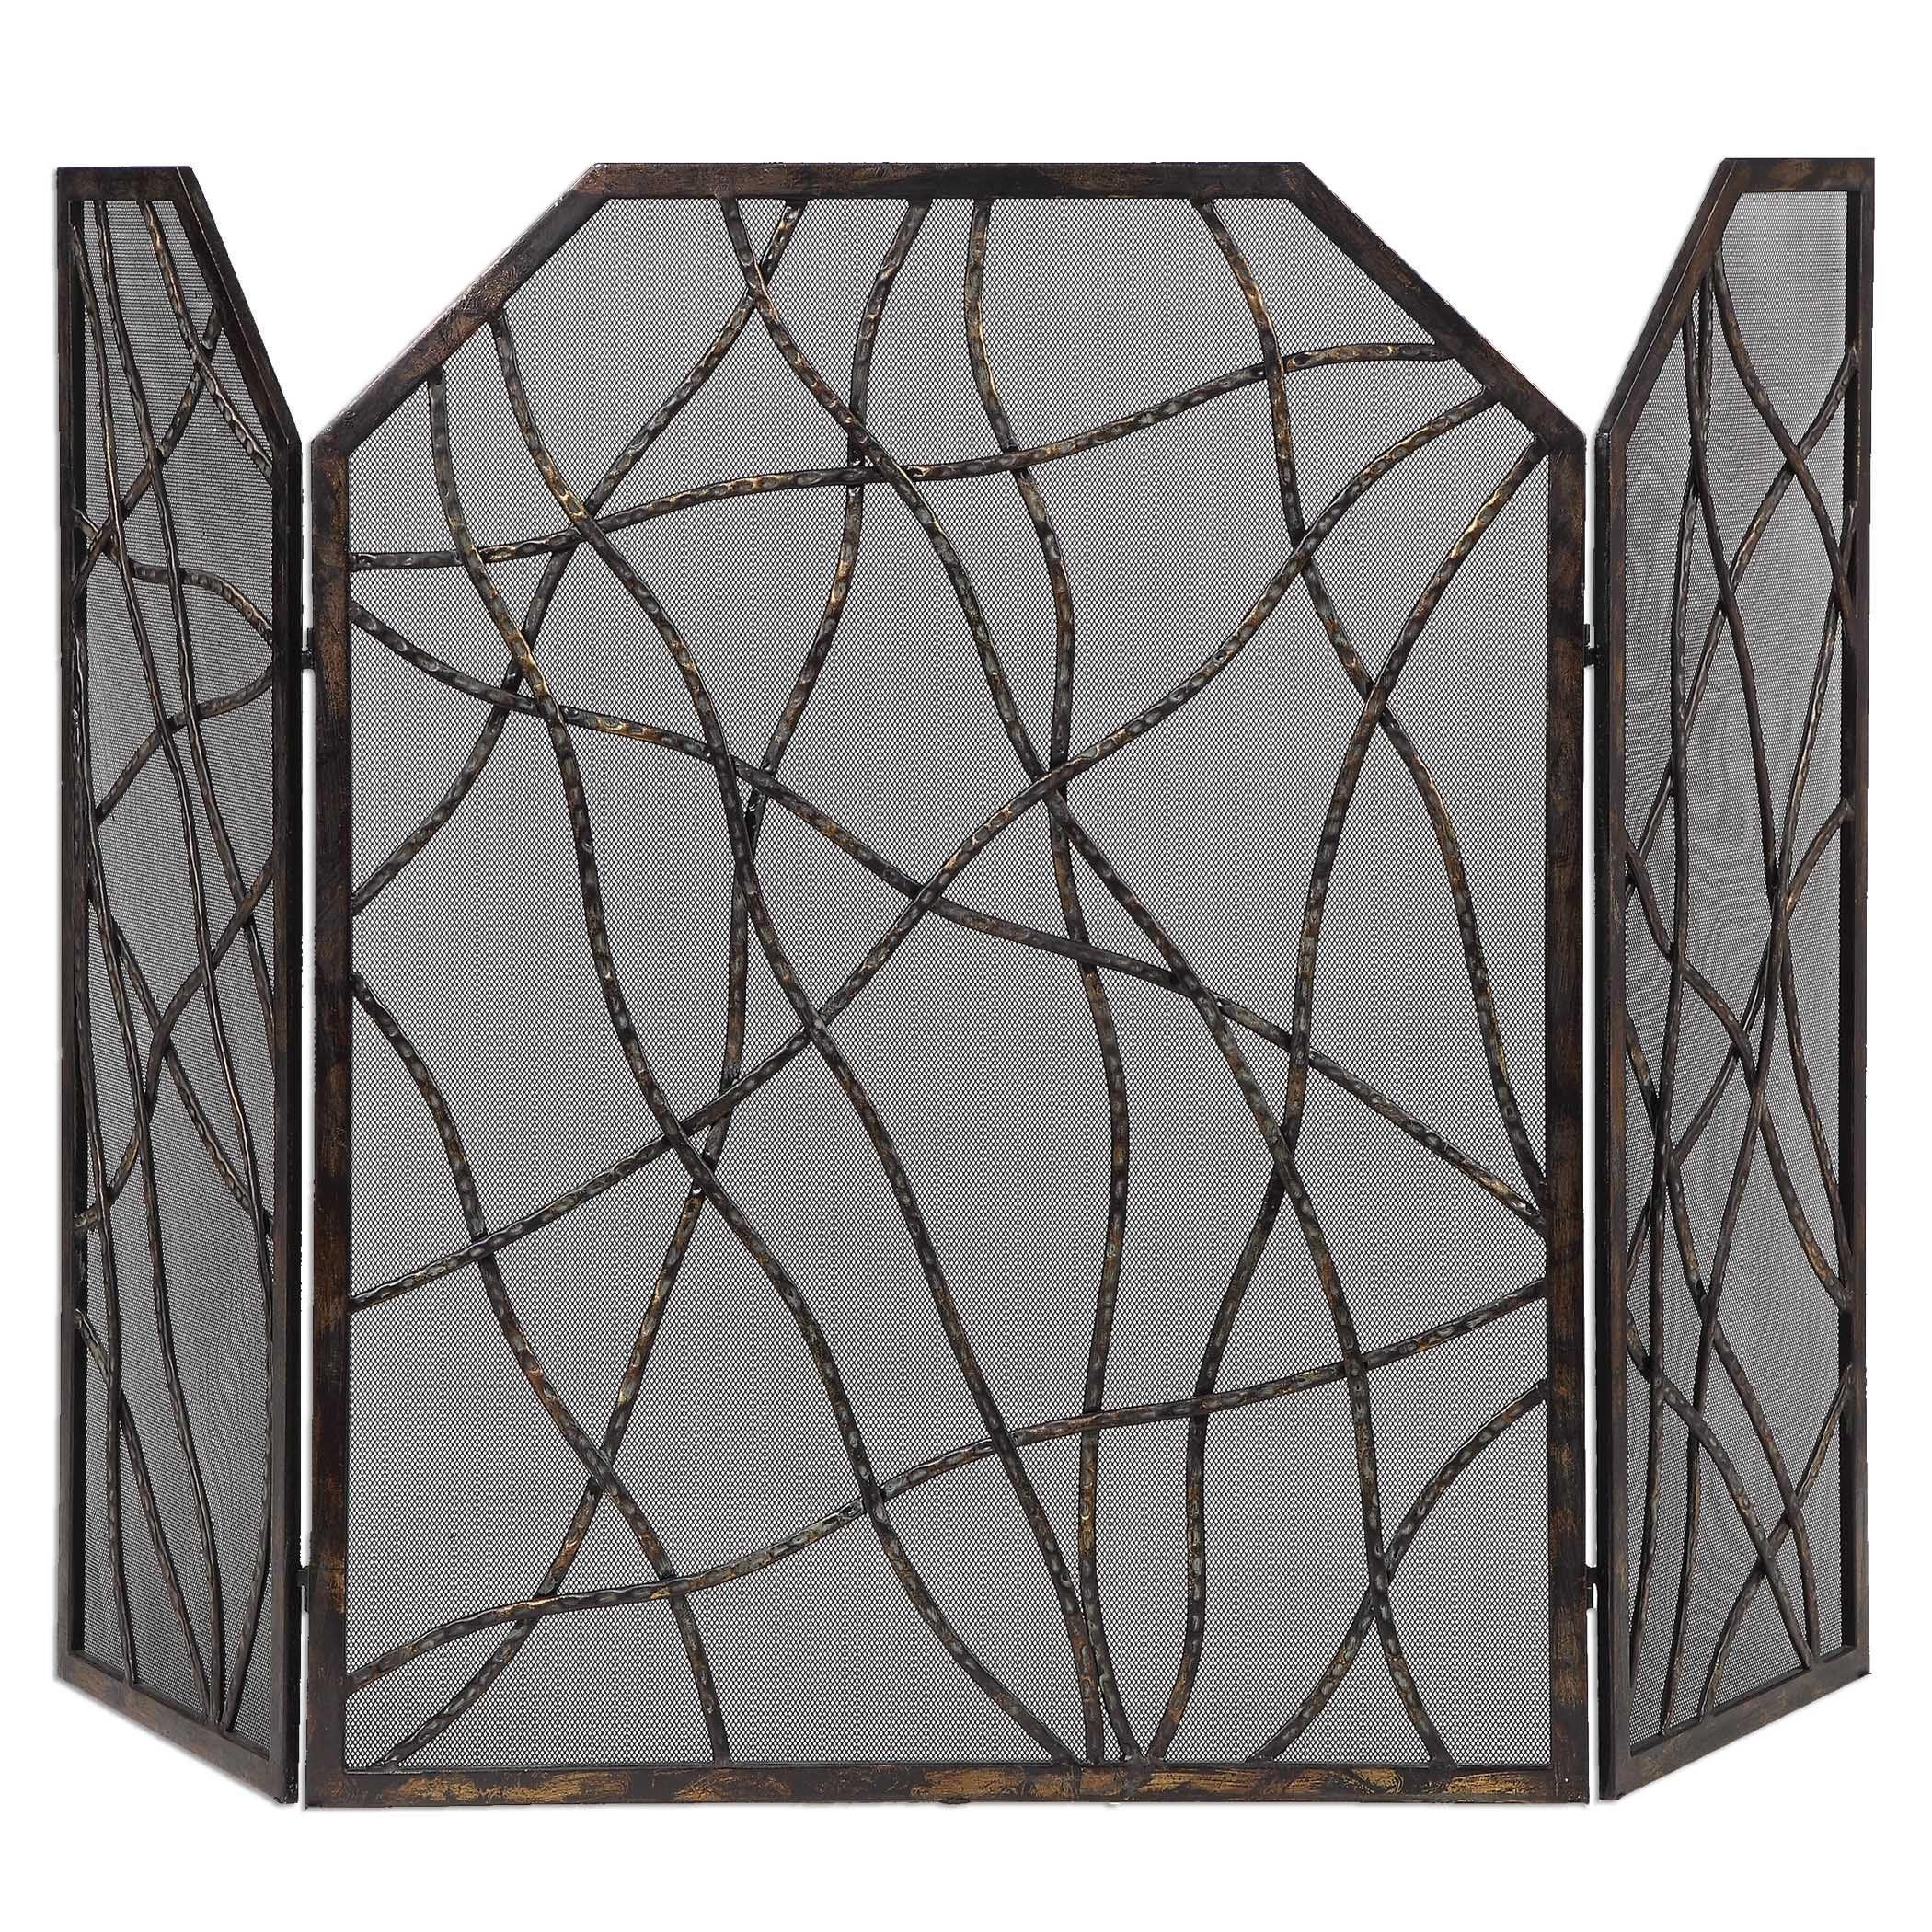 Mesh Fireplace Screen Elegant Uttermost Dorigrass Fireplace Screen Want It